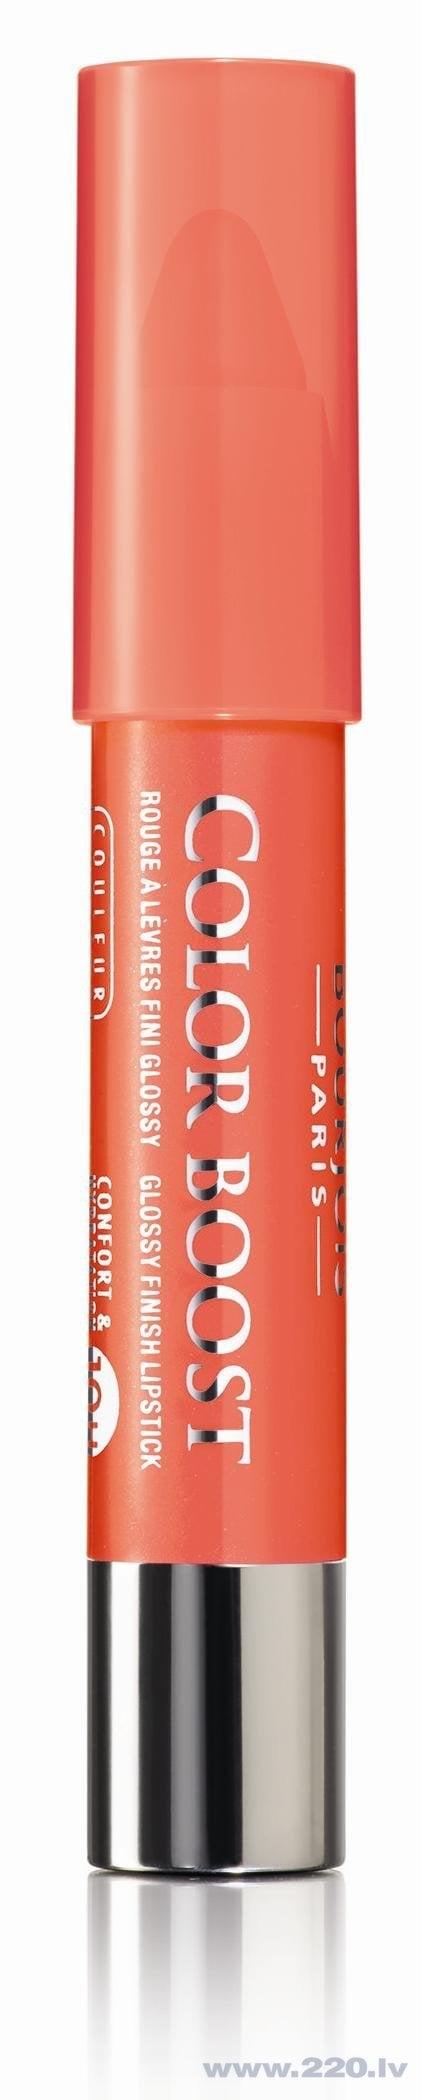 Zīmulis-lūpu spīdums Bourjois Color Boost, 5.7 ml cena